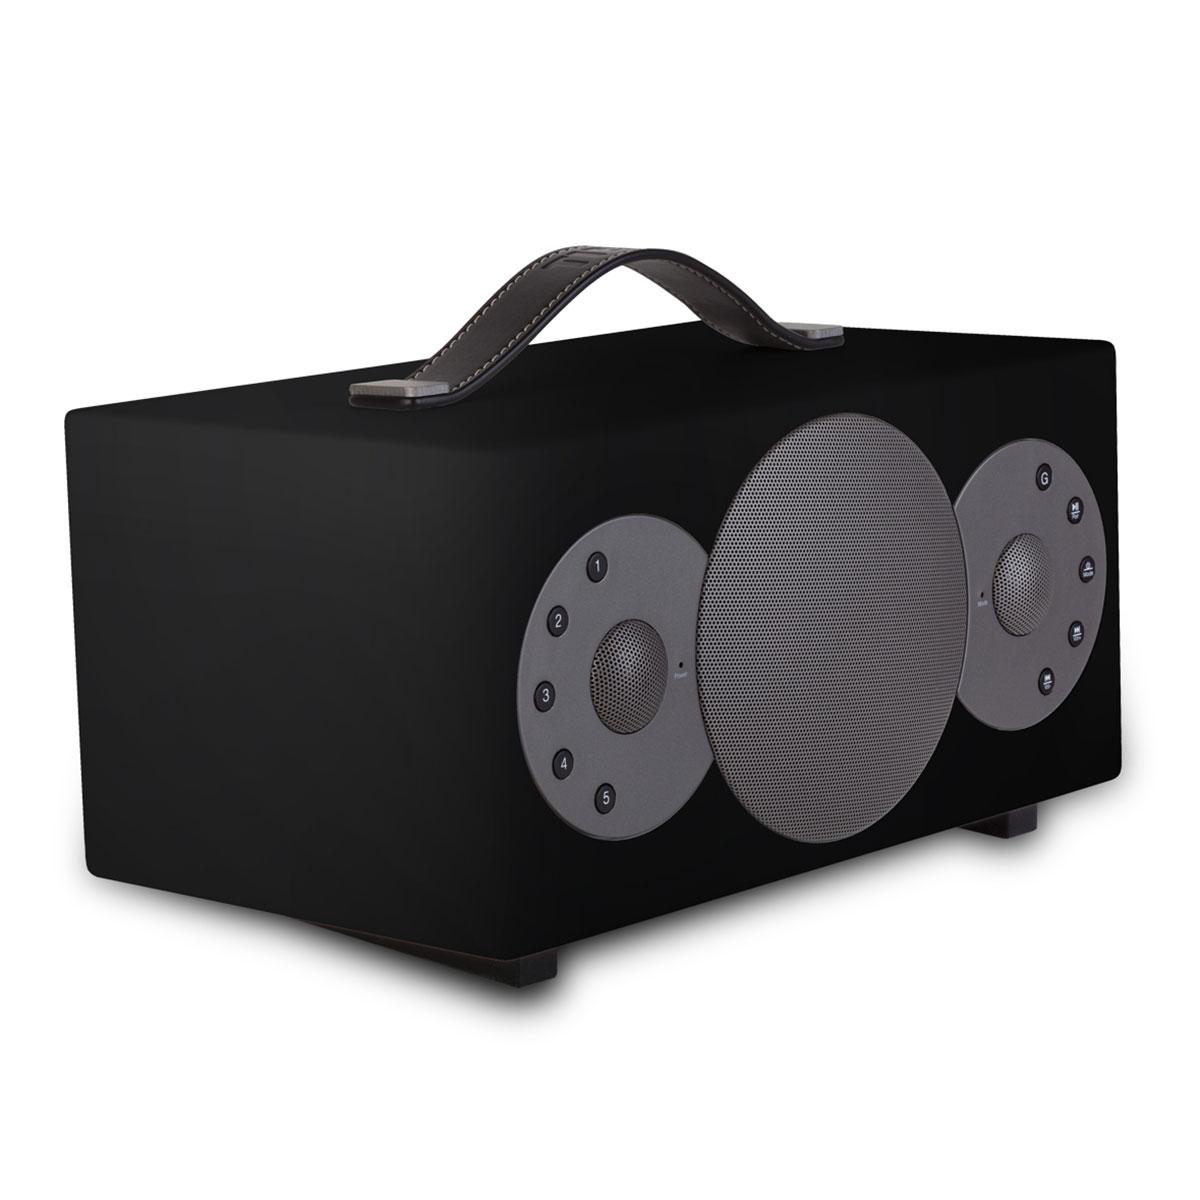 Tibo multiplay højttaler - Sphere 2 - Sort